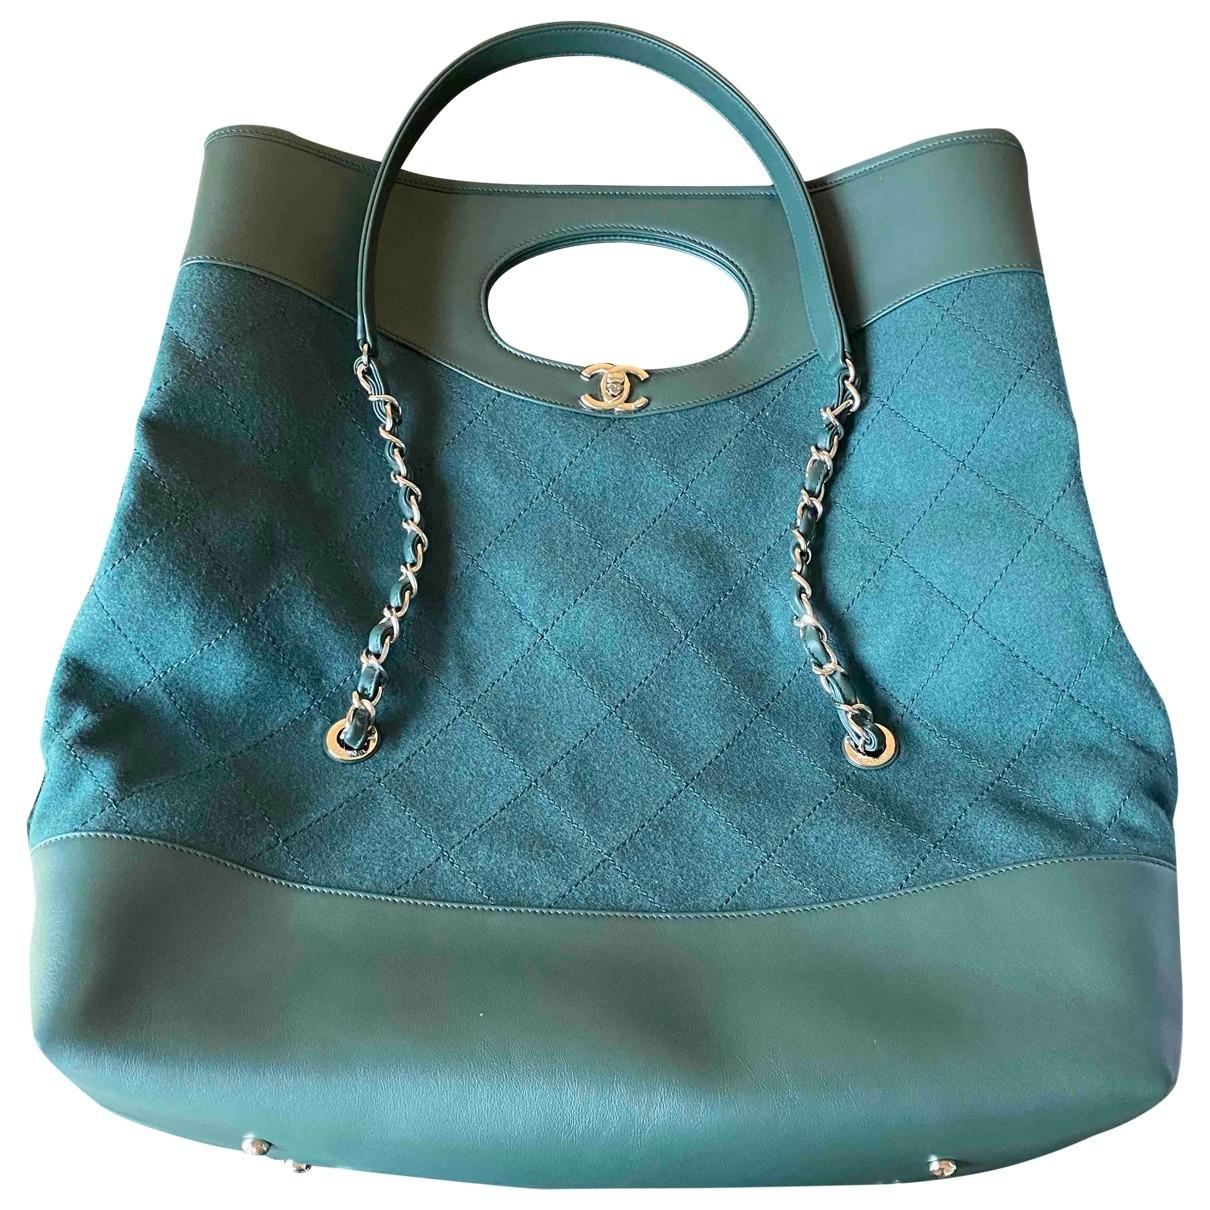 Chanel - Sac a main 31 pour femme en cuir - vert